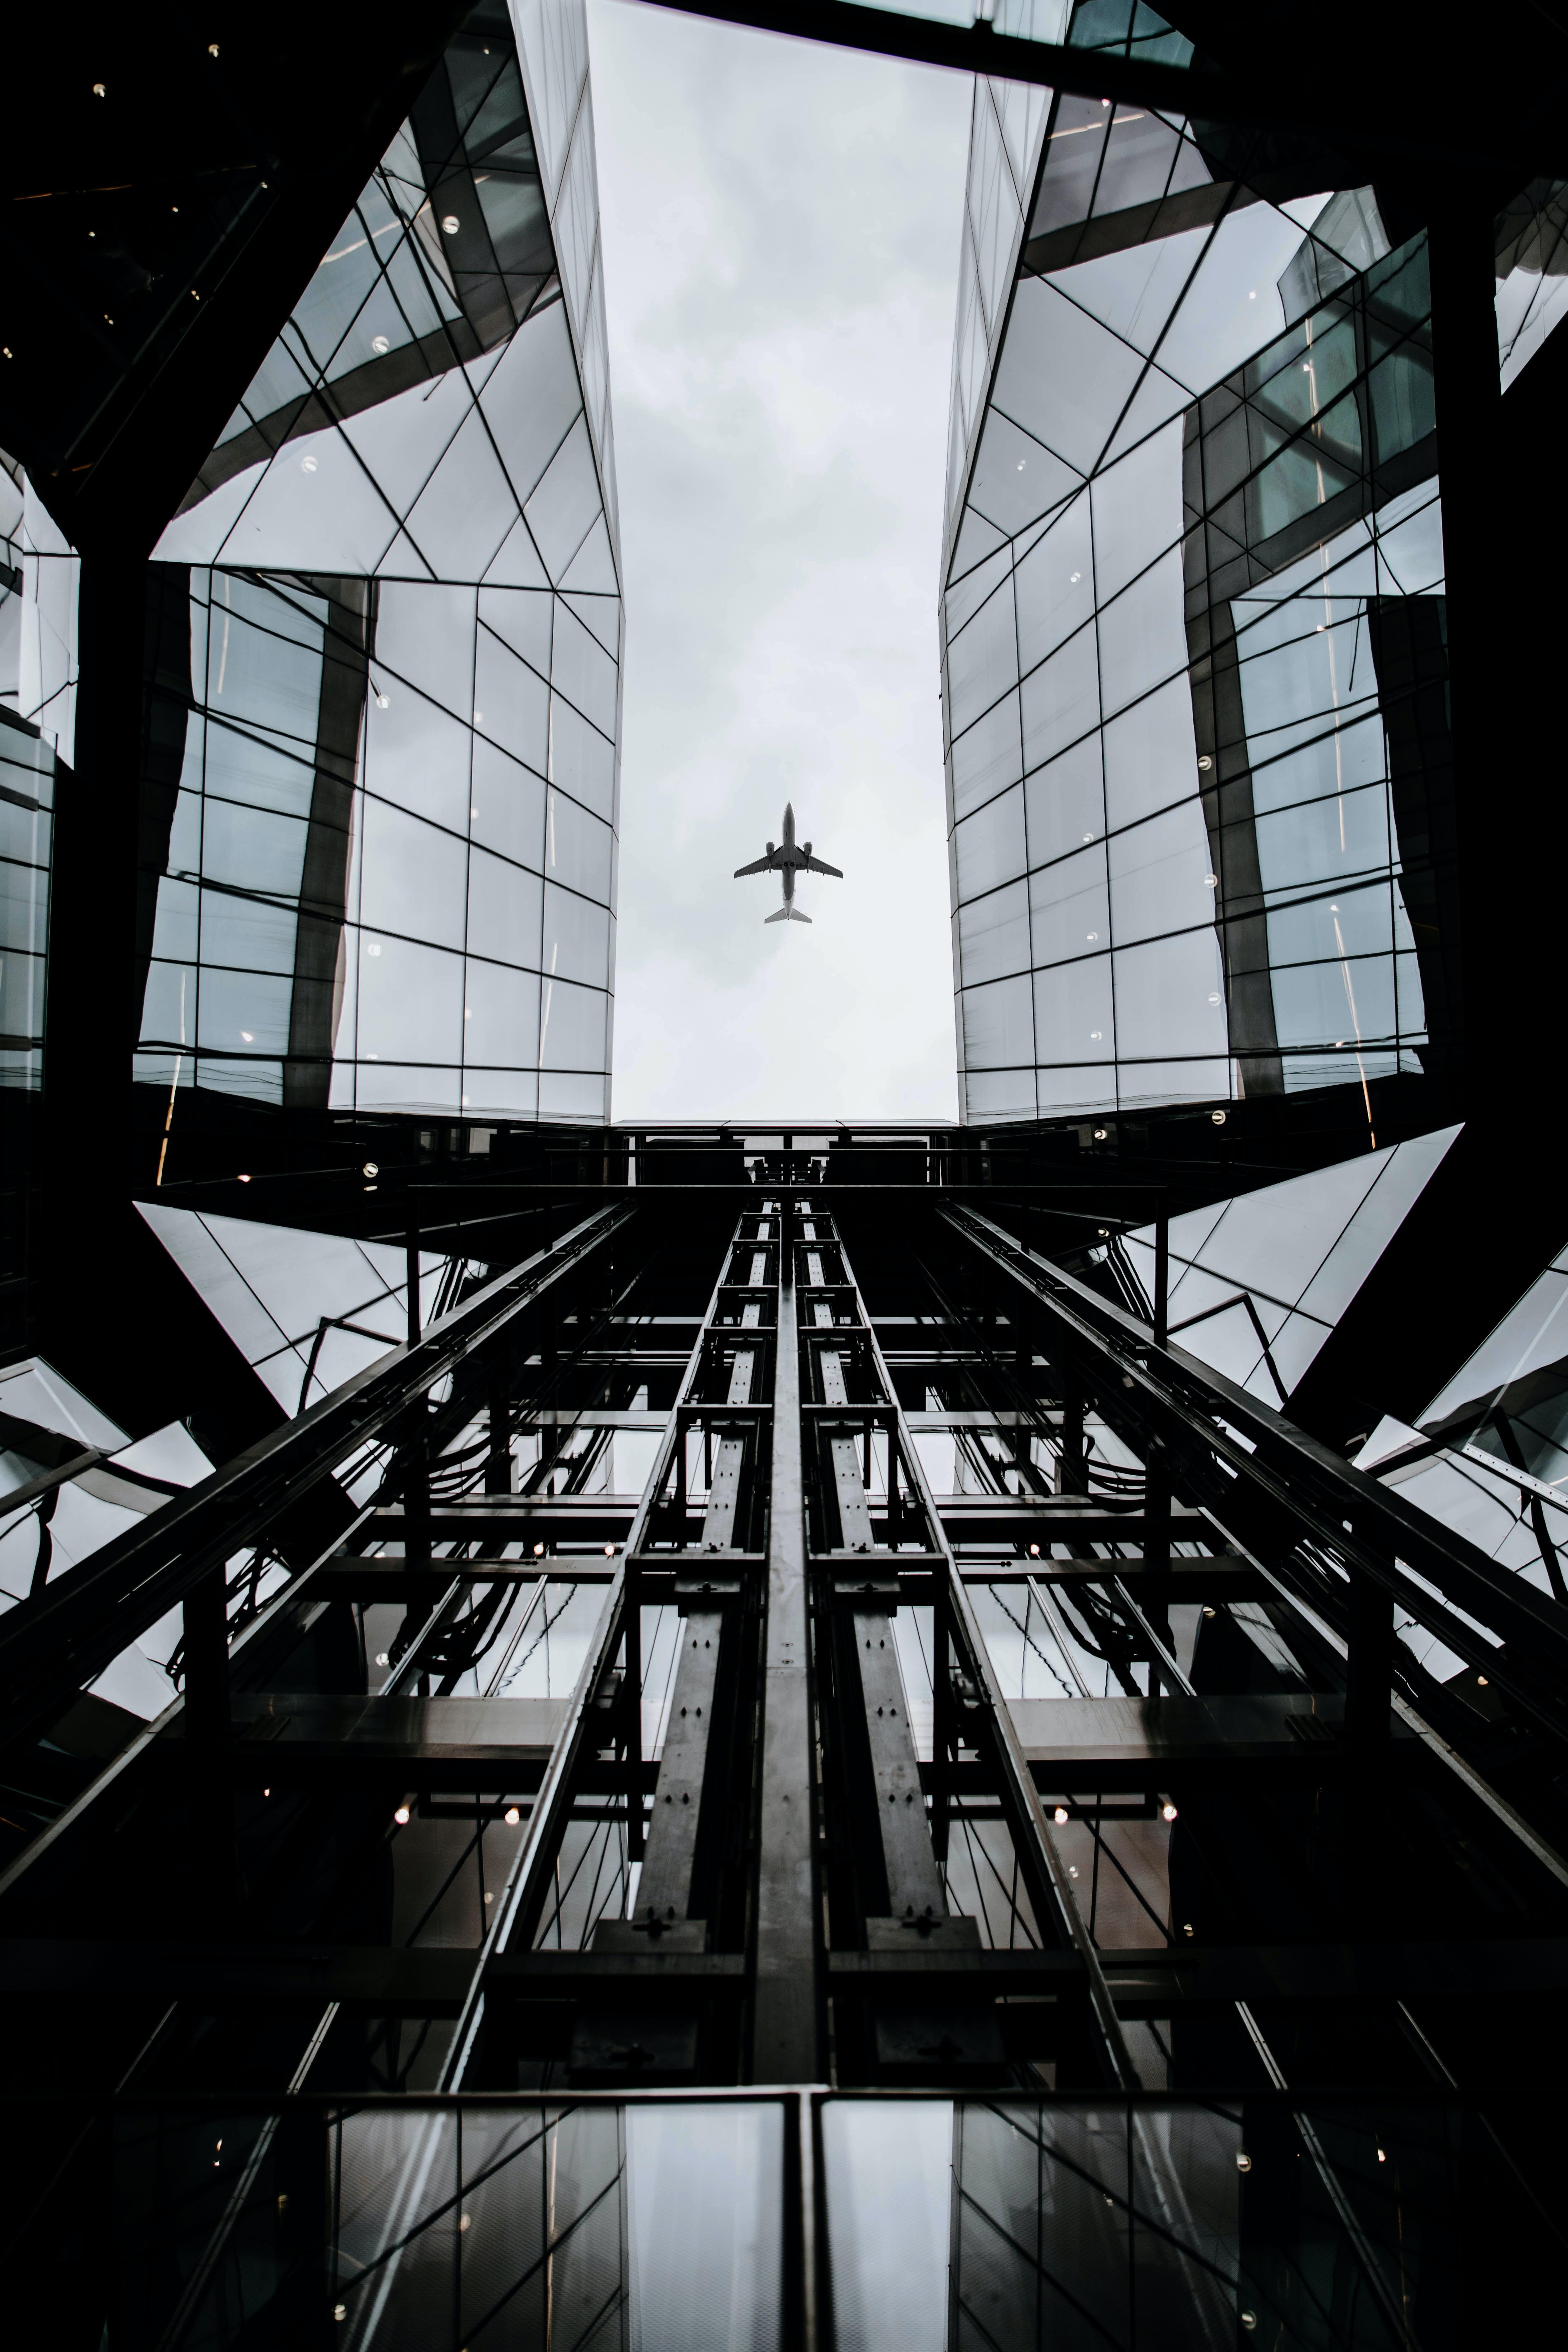 high-angle photography of plane on air